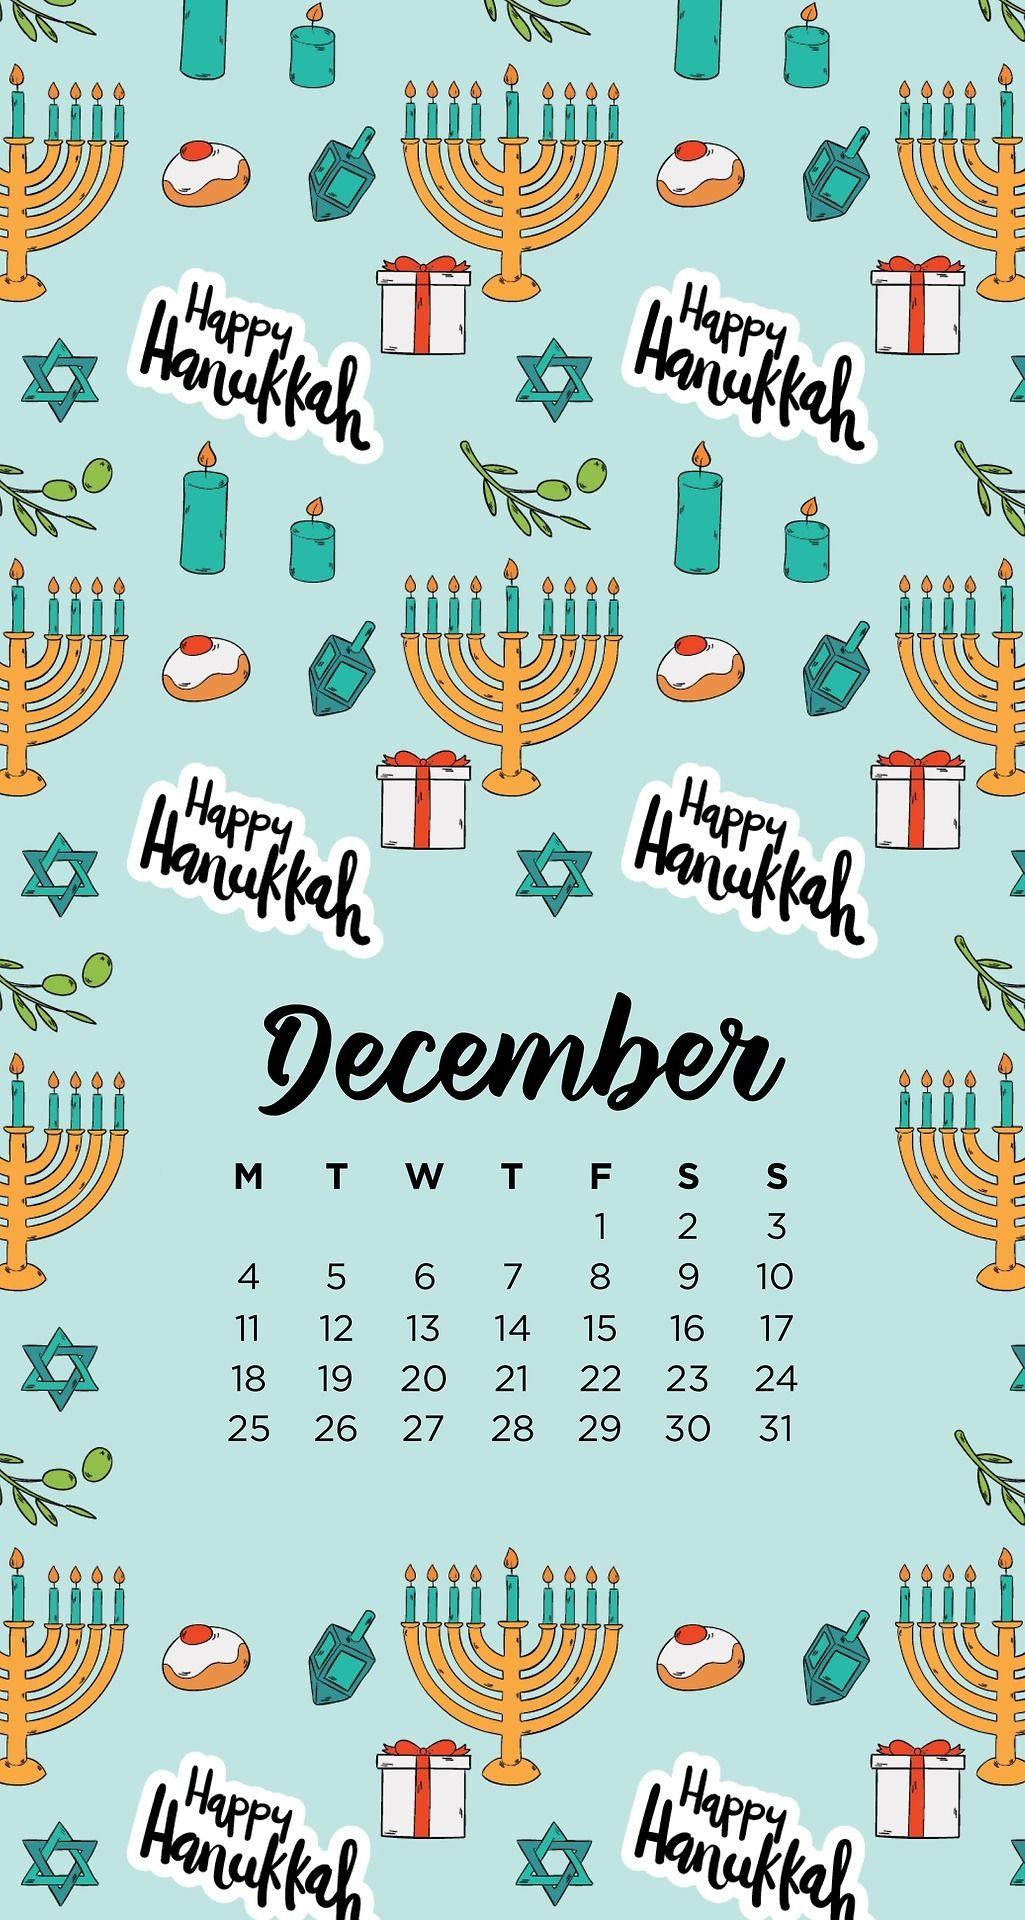 December Hanukkah Phone Wallpapers Holiday Iphone Wallpaper Holiday Wallpaper Phone Wallpaper